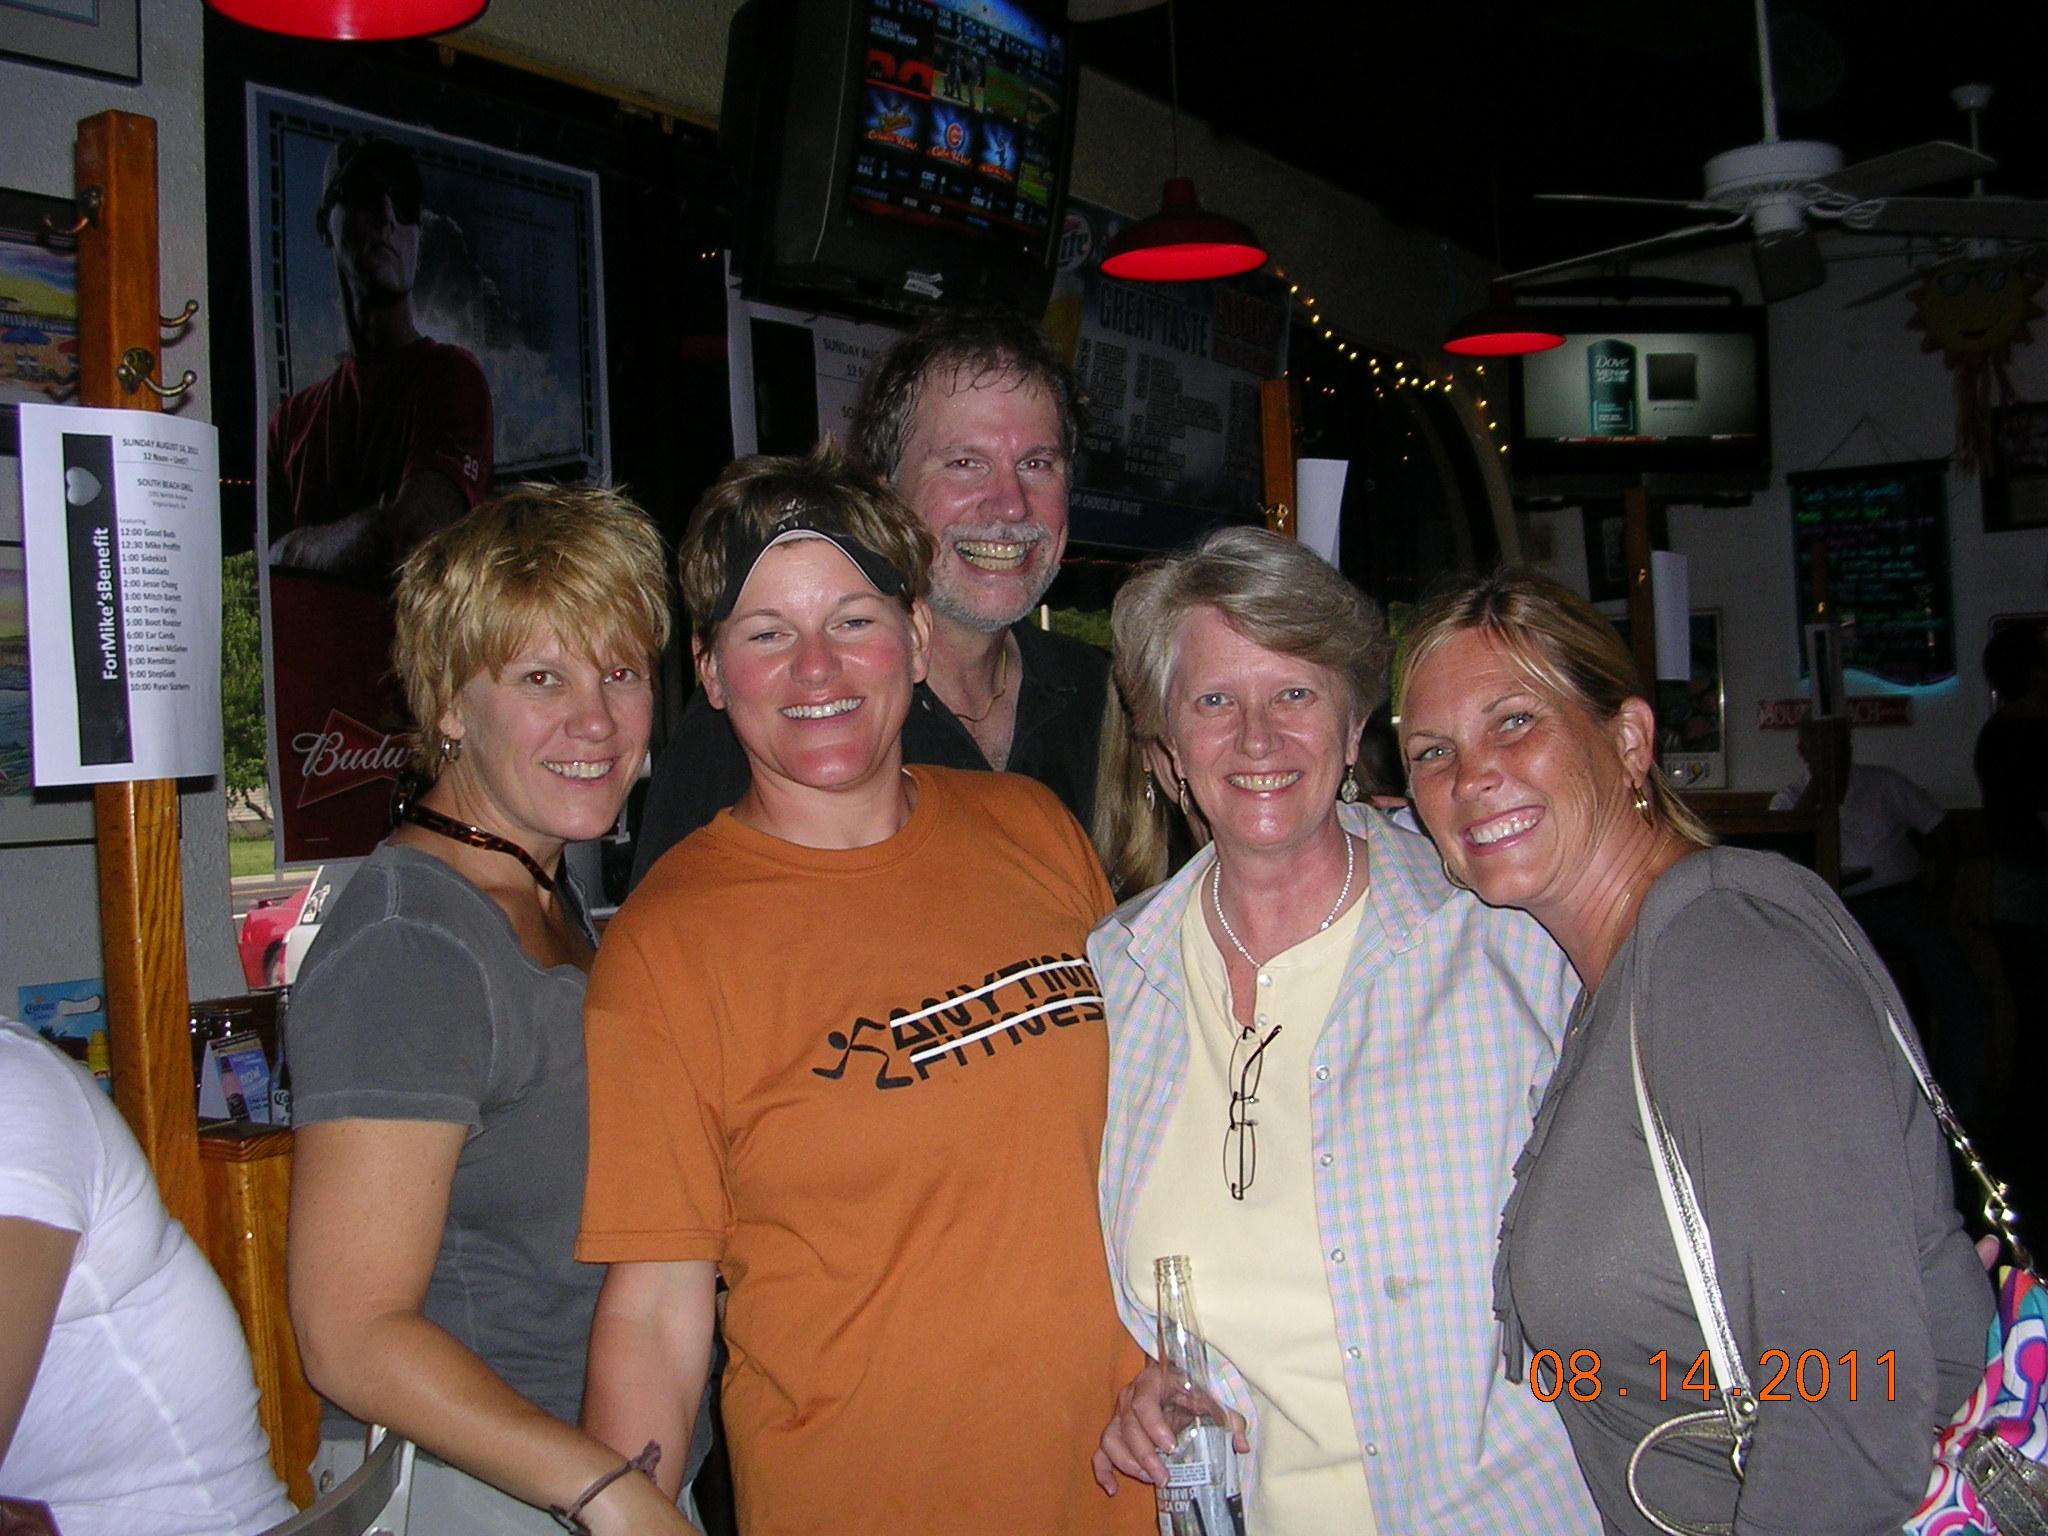 The ASP Crew